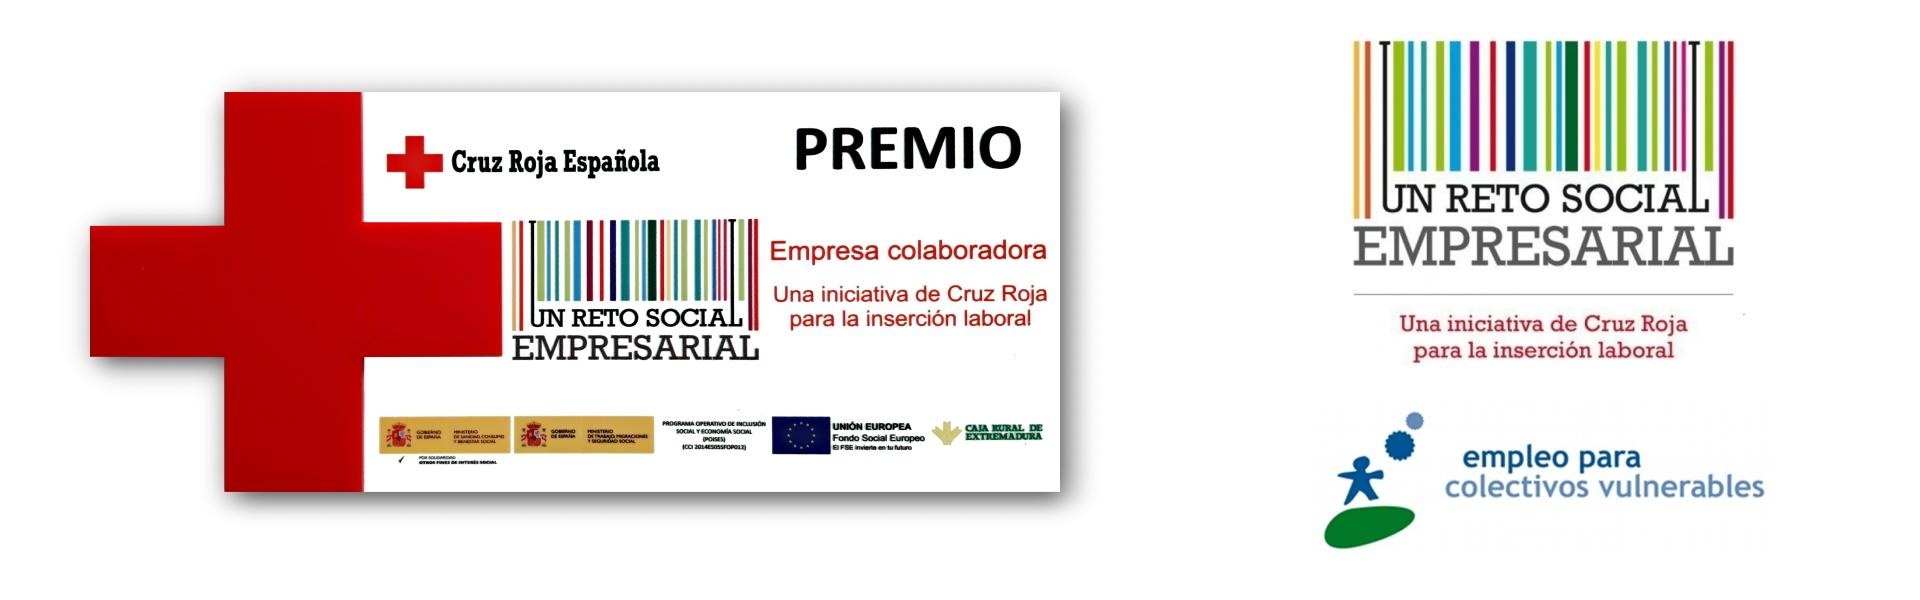 Premios Alianzas Badajoz